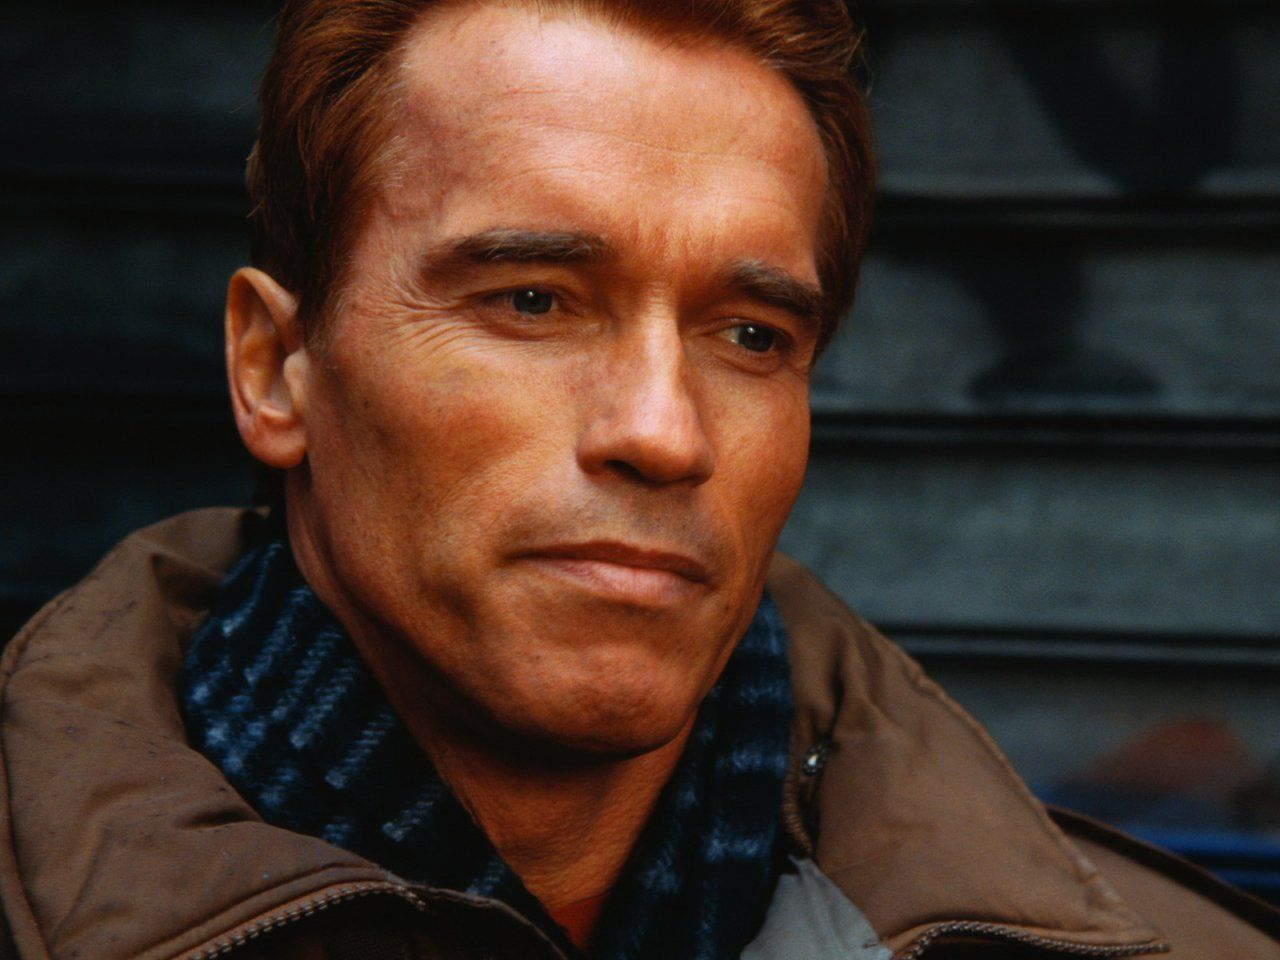 Arnold Schwarzenegger Jpg Jpeg Image 1280 960 Pixels Scaled 62 Cine Dibujos Personajes